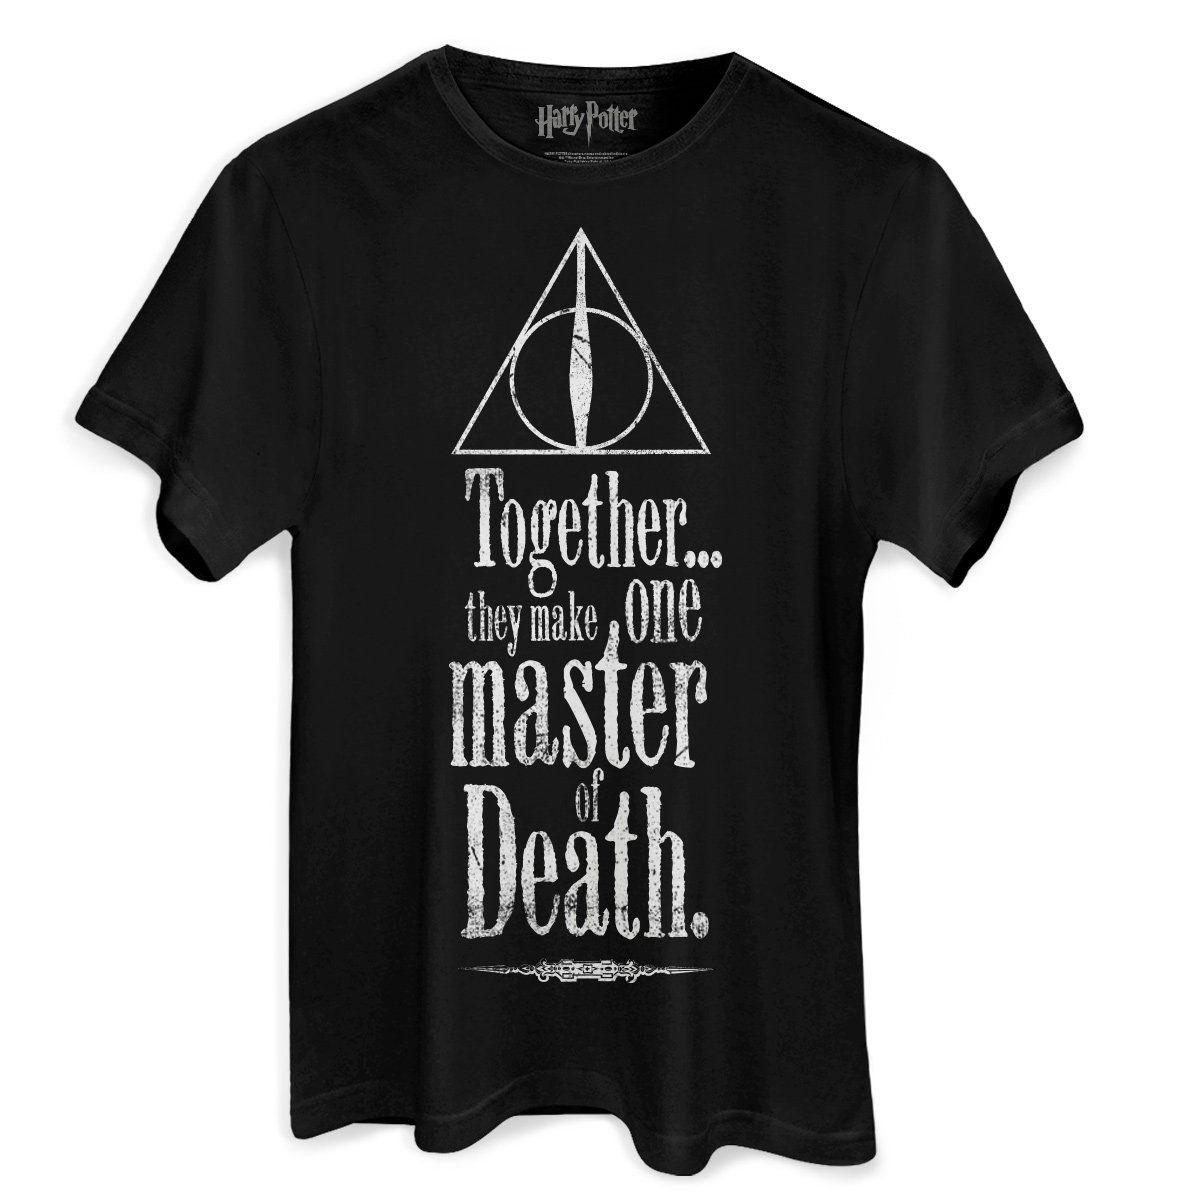 Camiseta Masculina Harry Potter The Deathly Hallows  - bandUP Store Marketplace